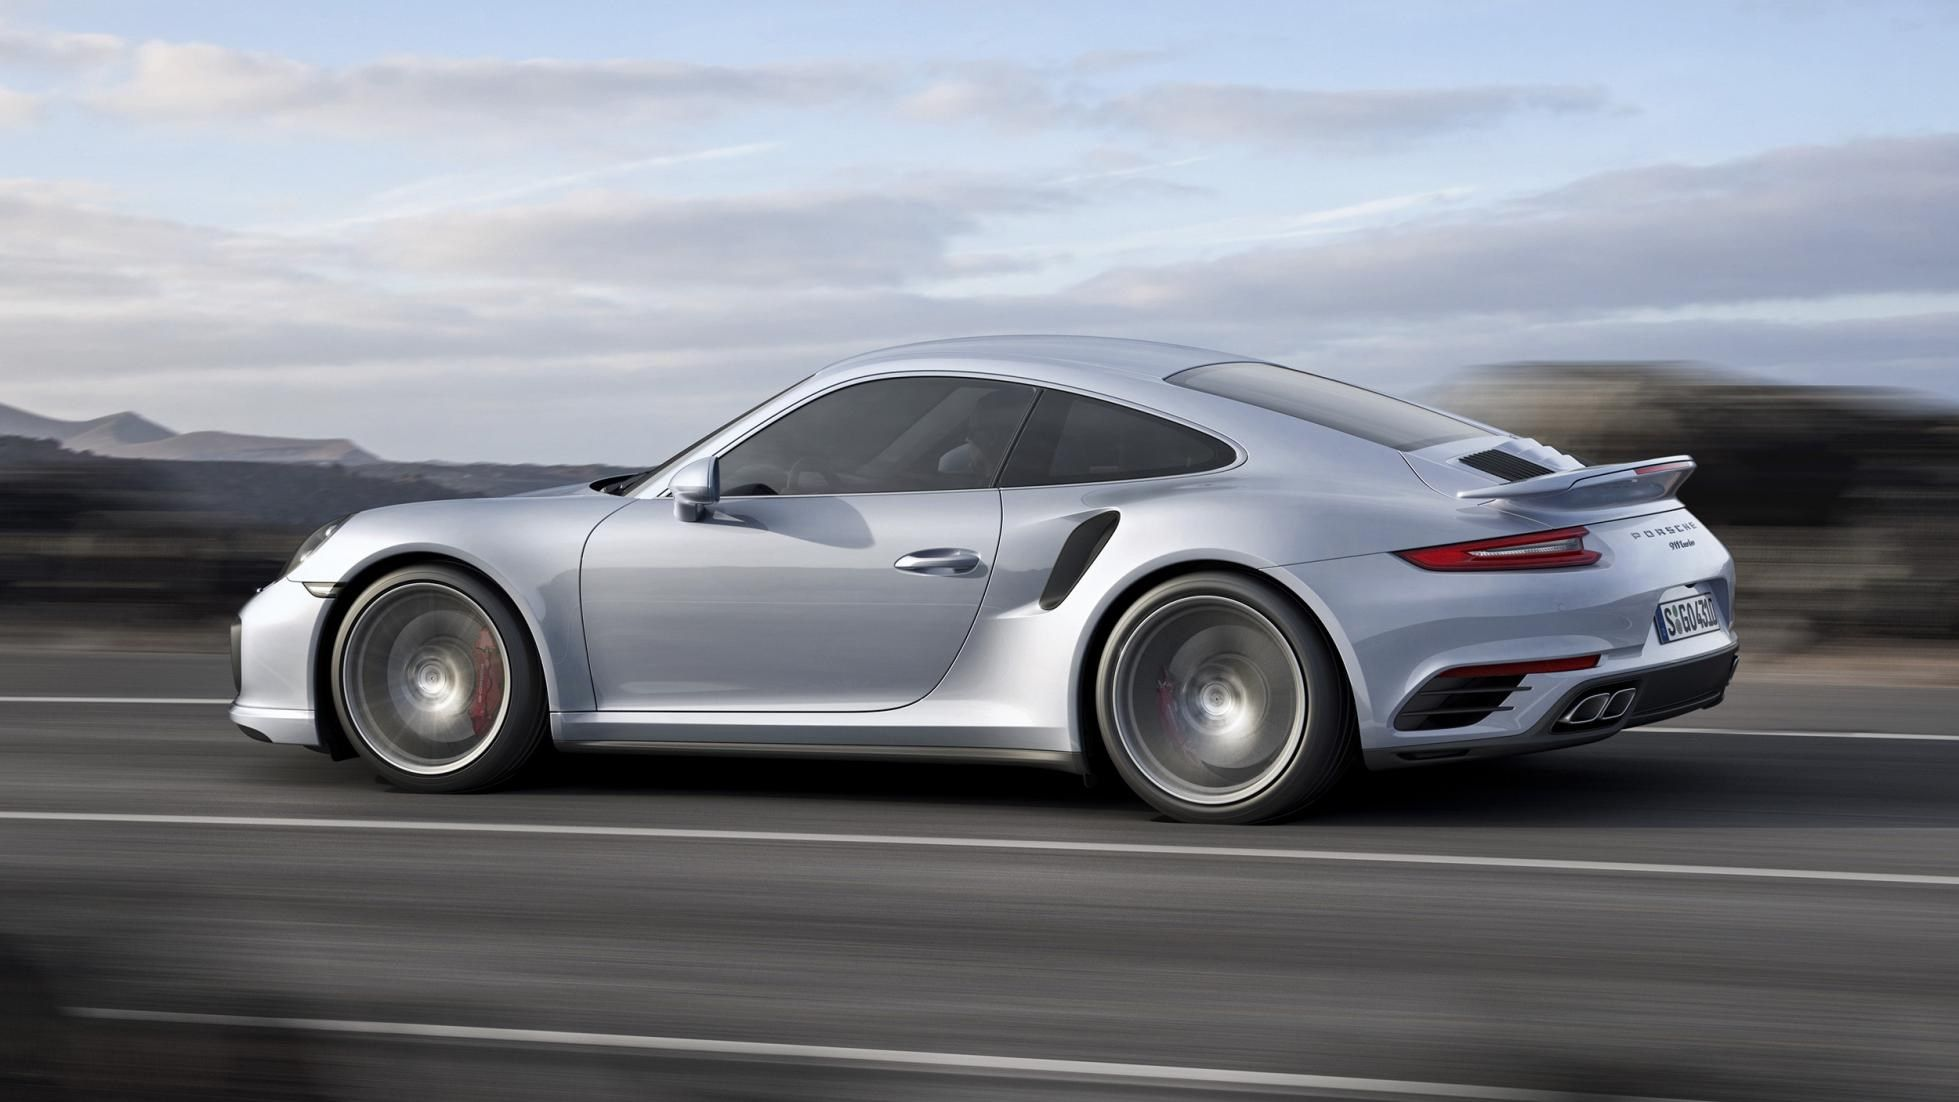 46aeefa5dc35cc2785936dfb63bd2593 Mesmerizing Porsche 918 Spyder London Ontario Cars Trend